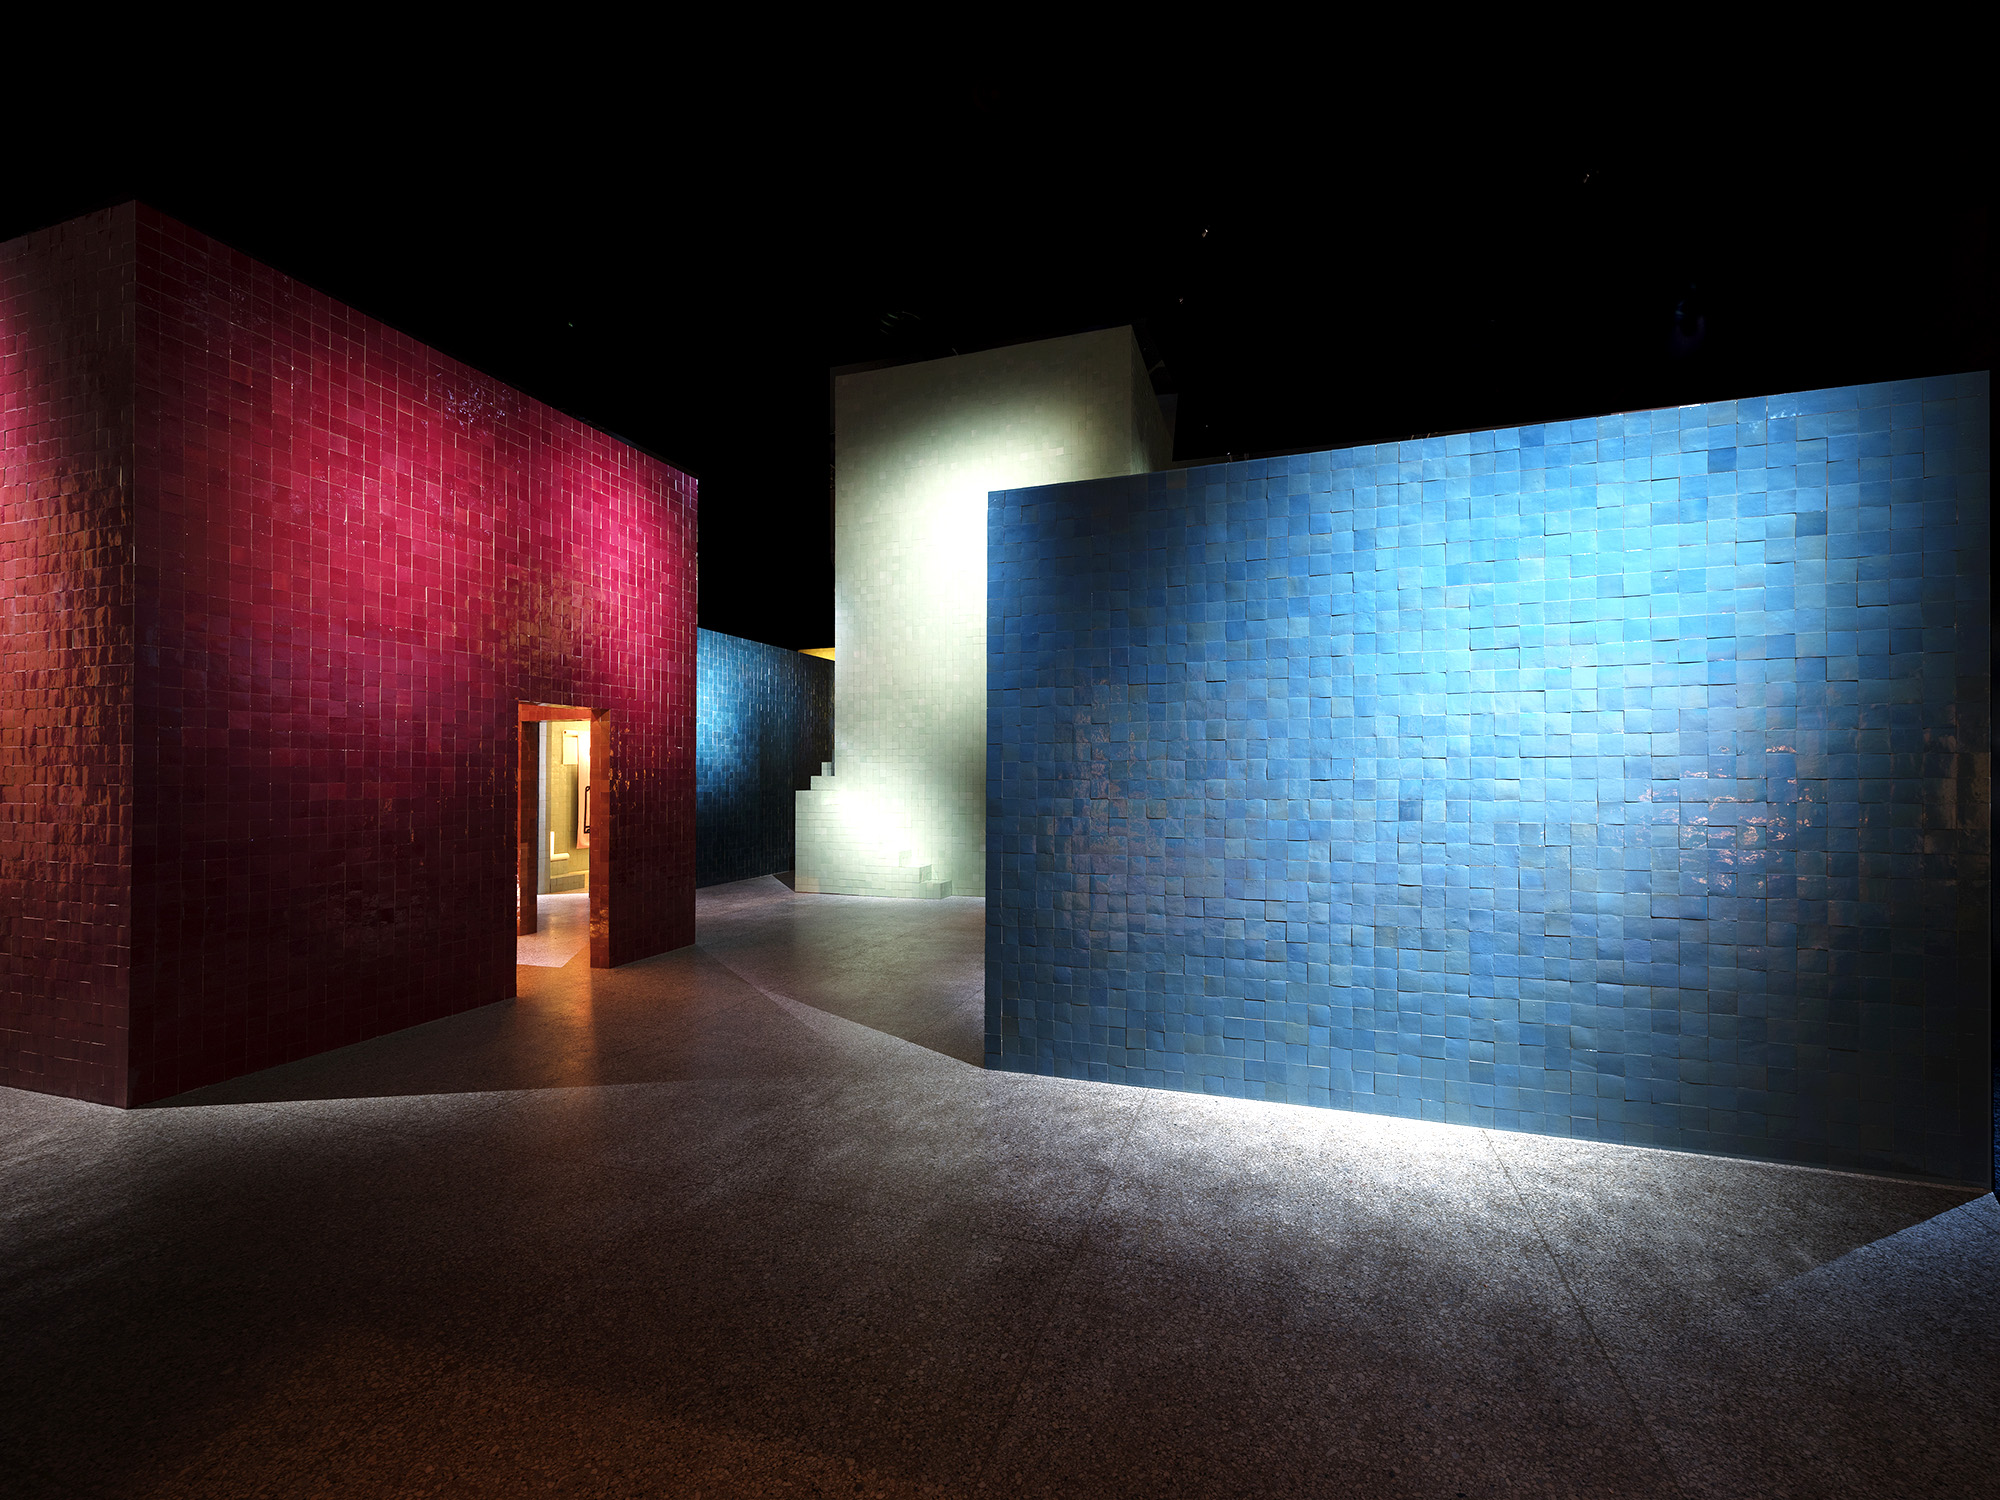 pavillon-hermes-2018-image8